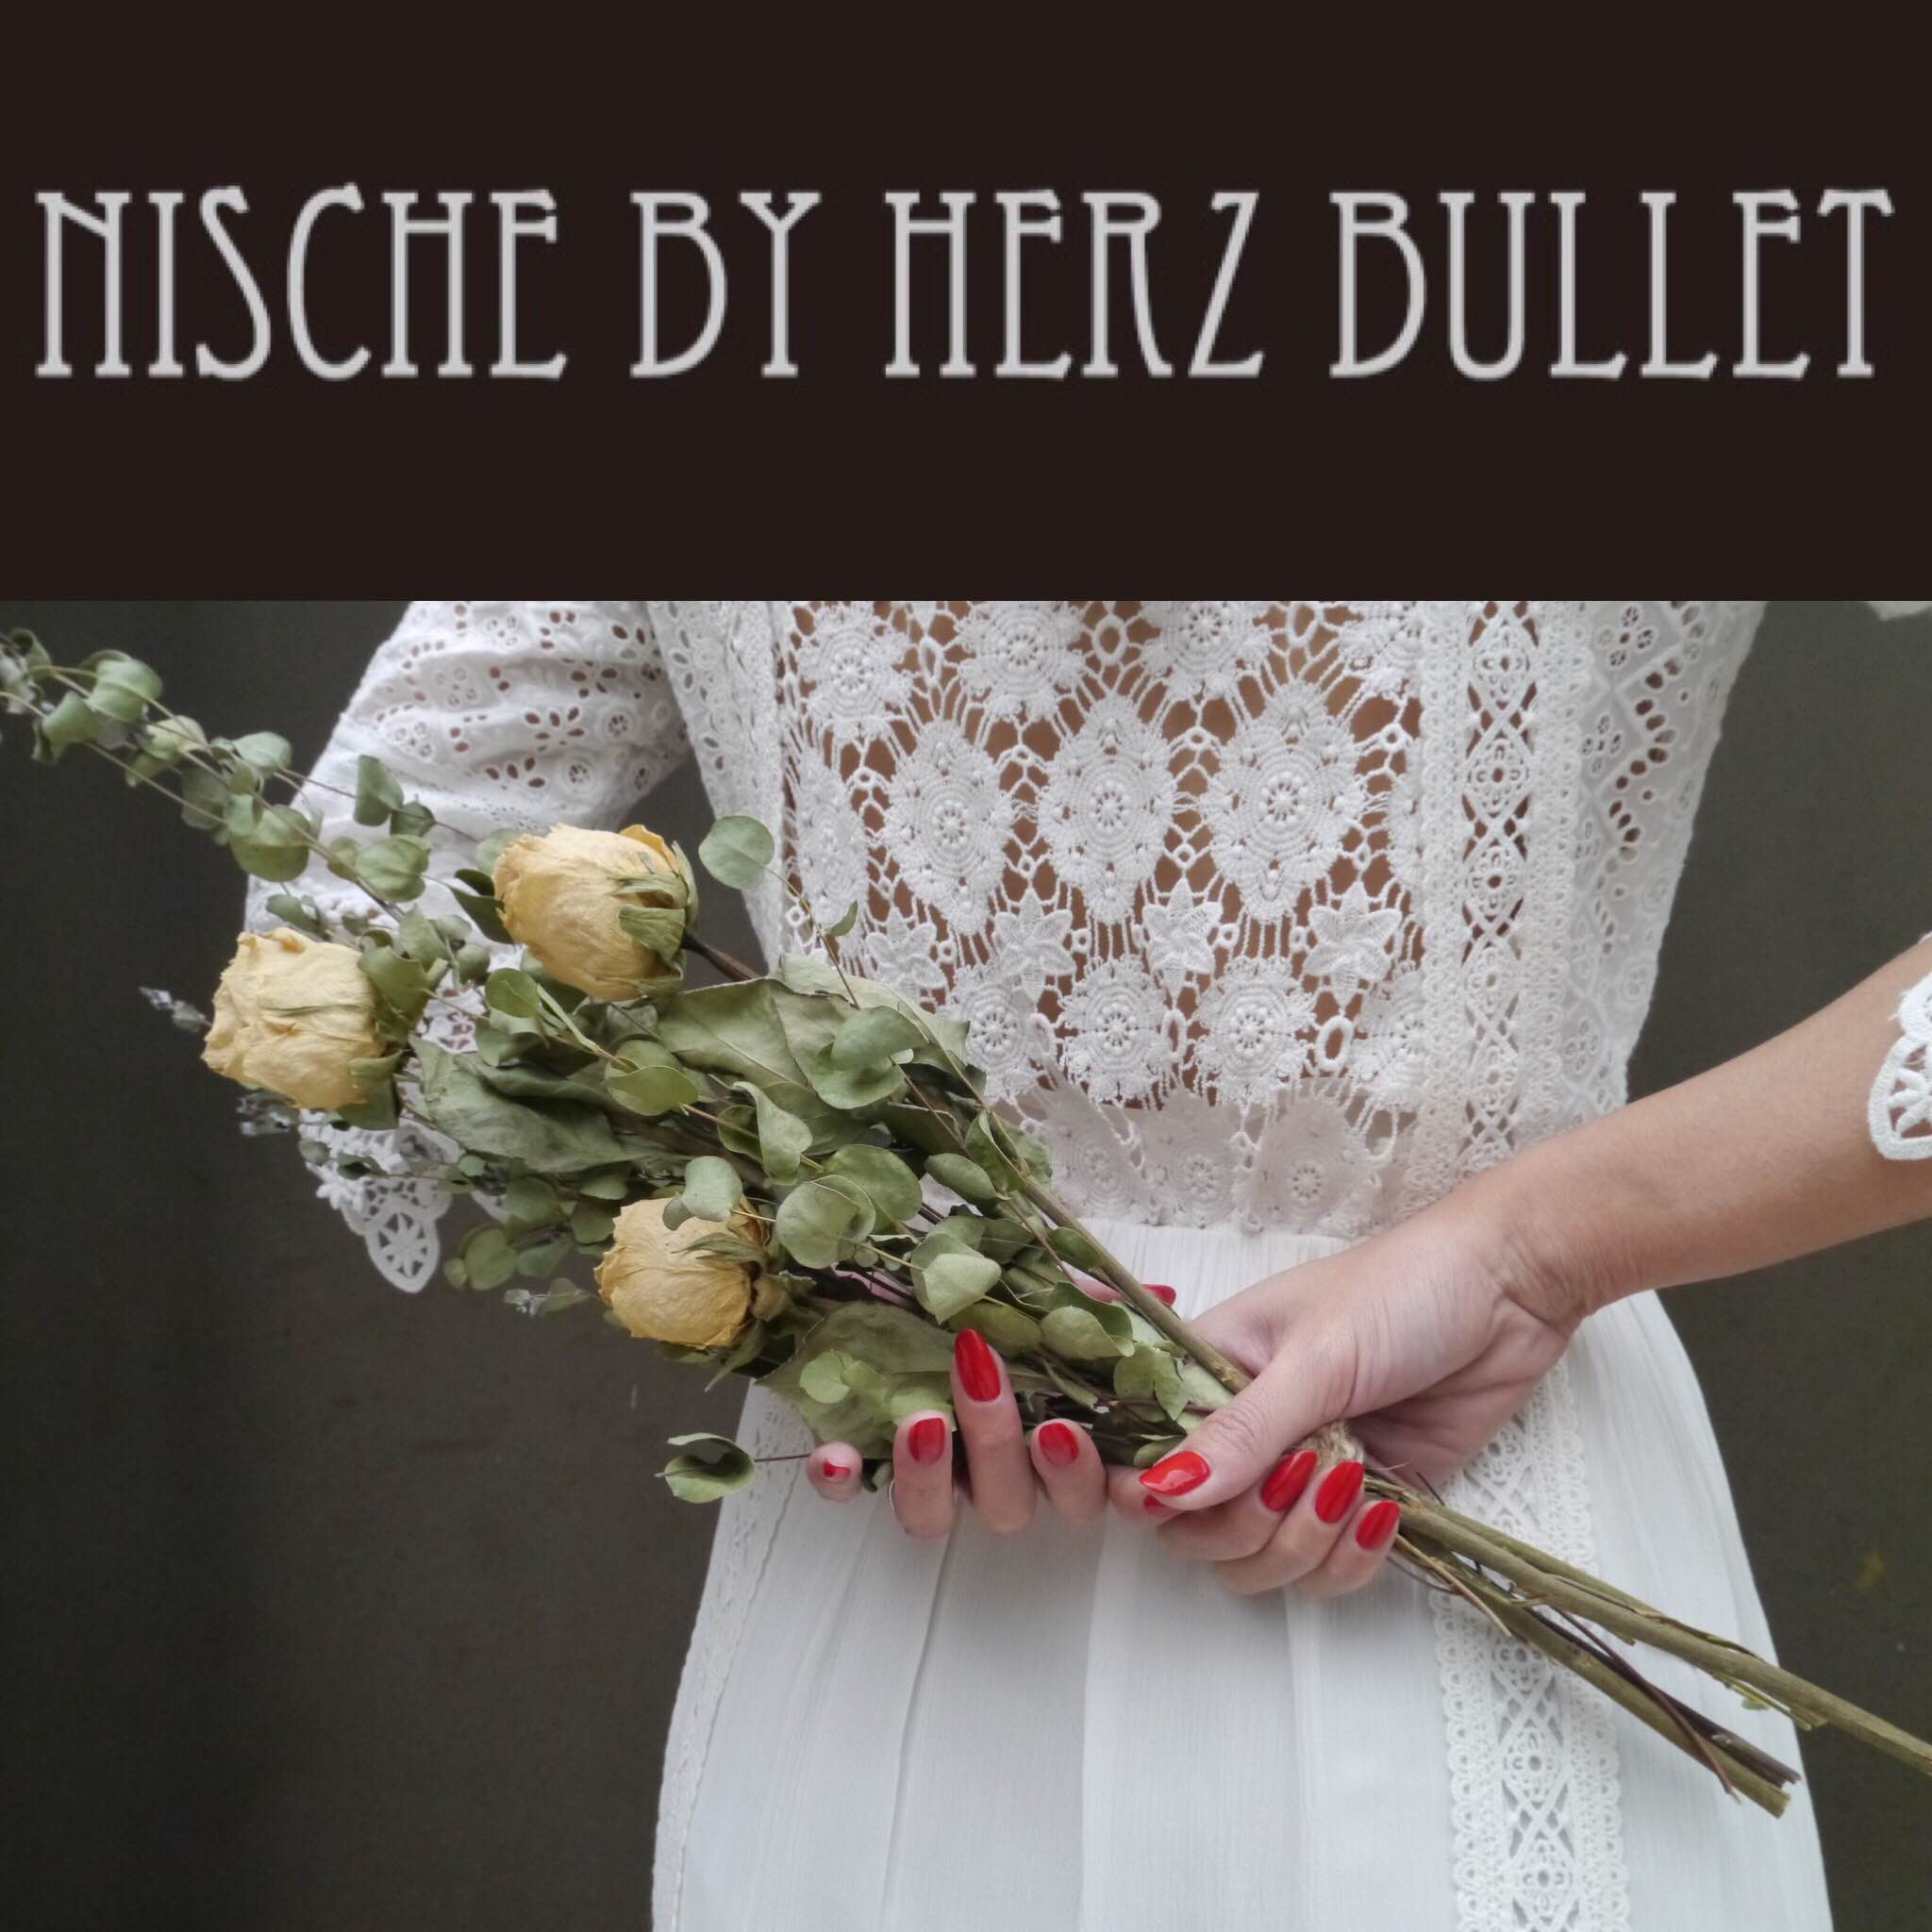 nische by herz bulletの内覧